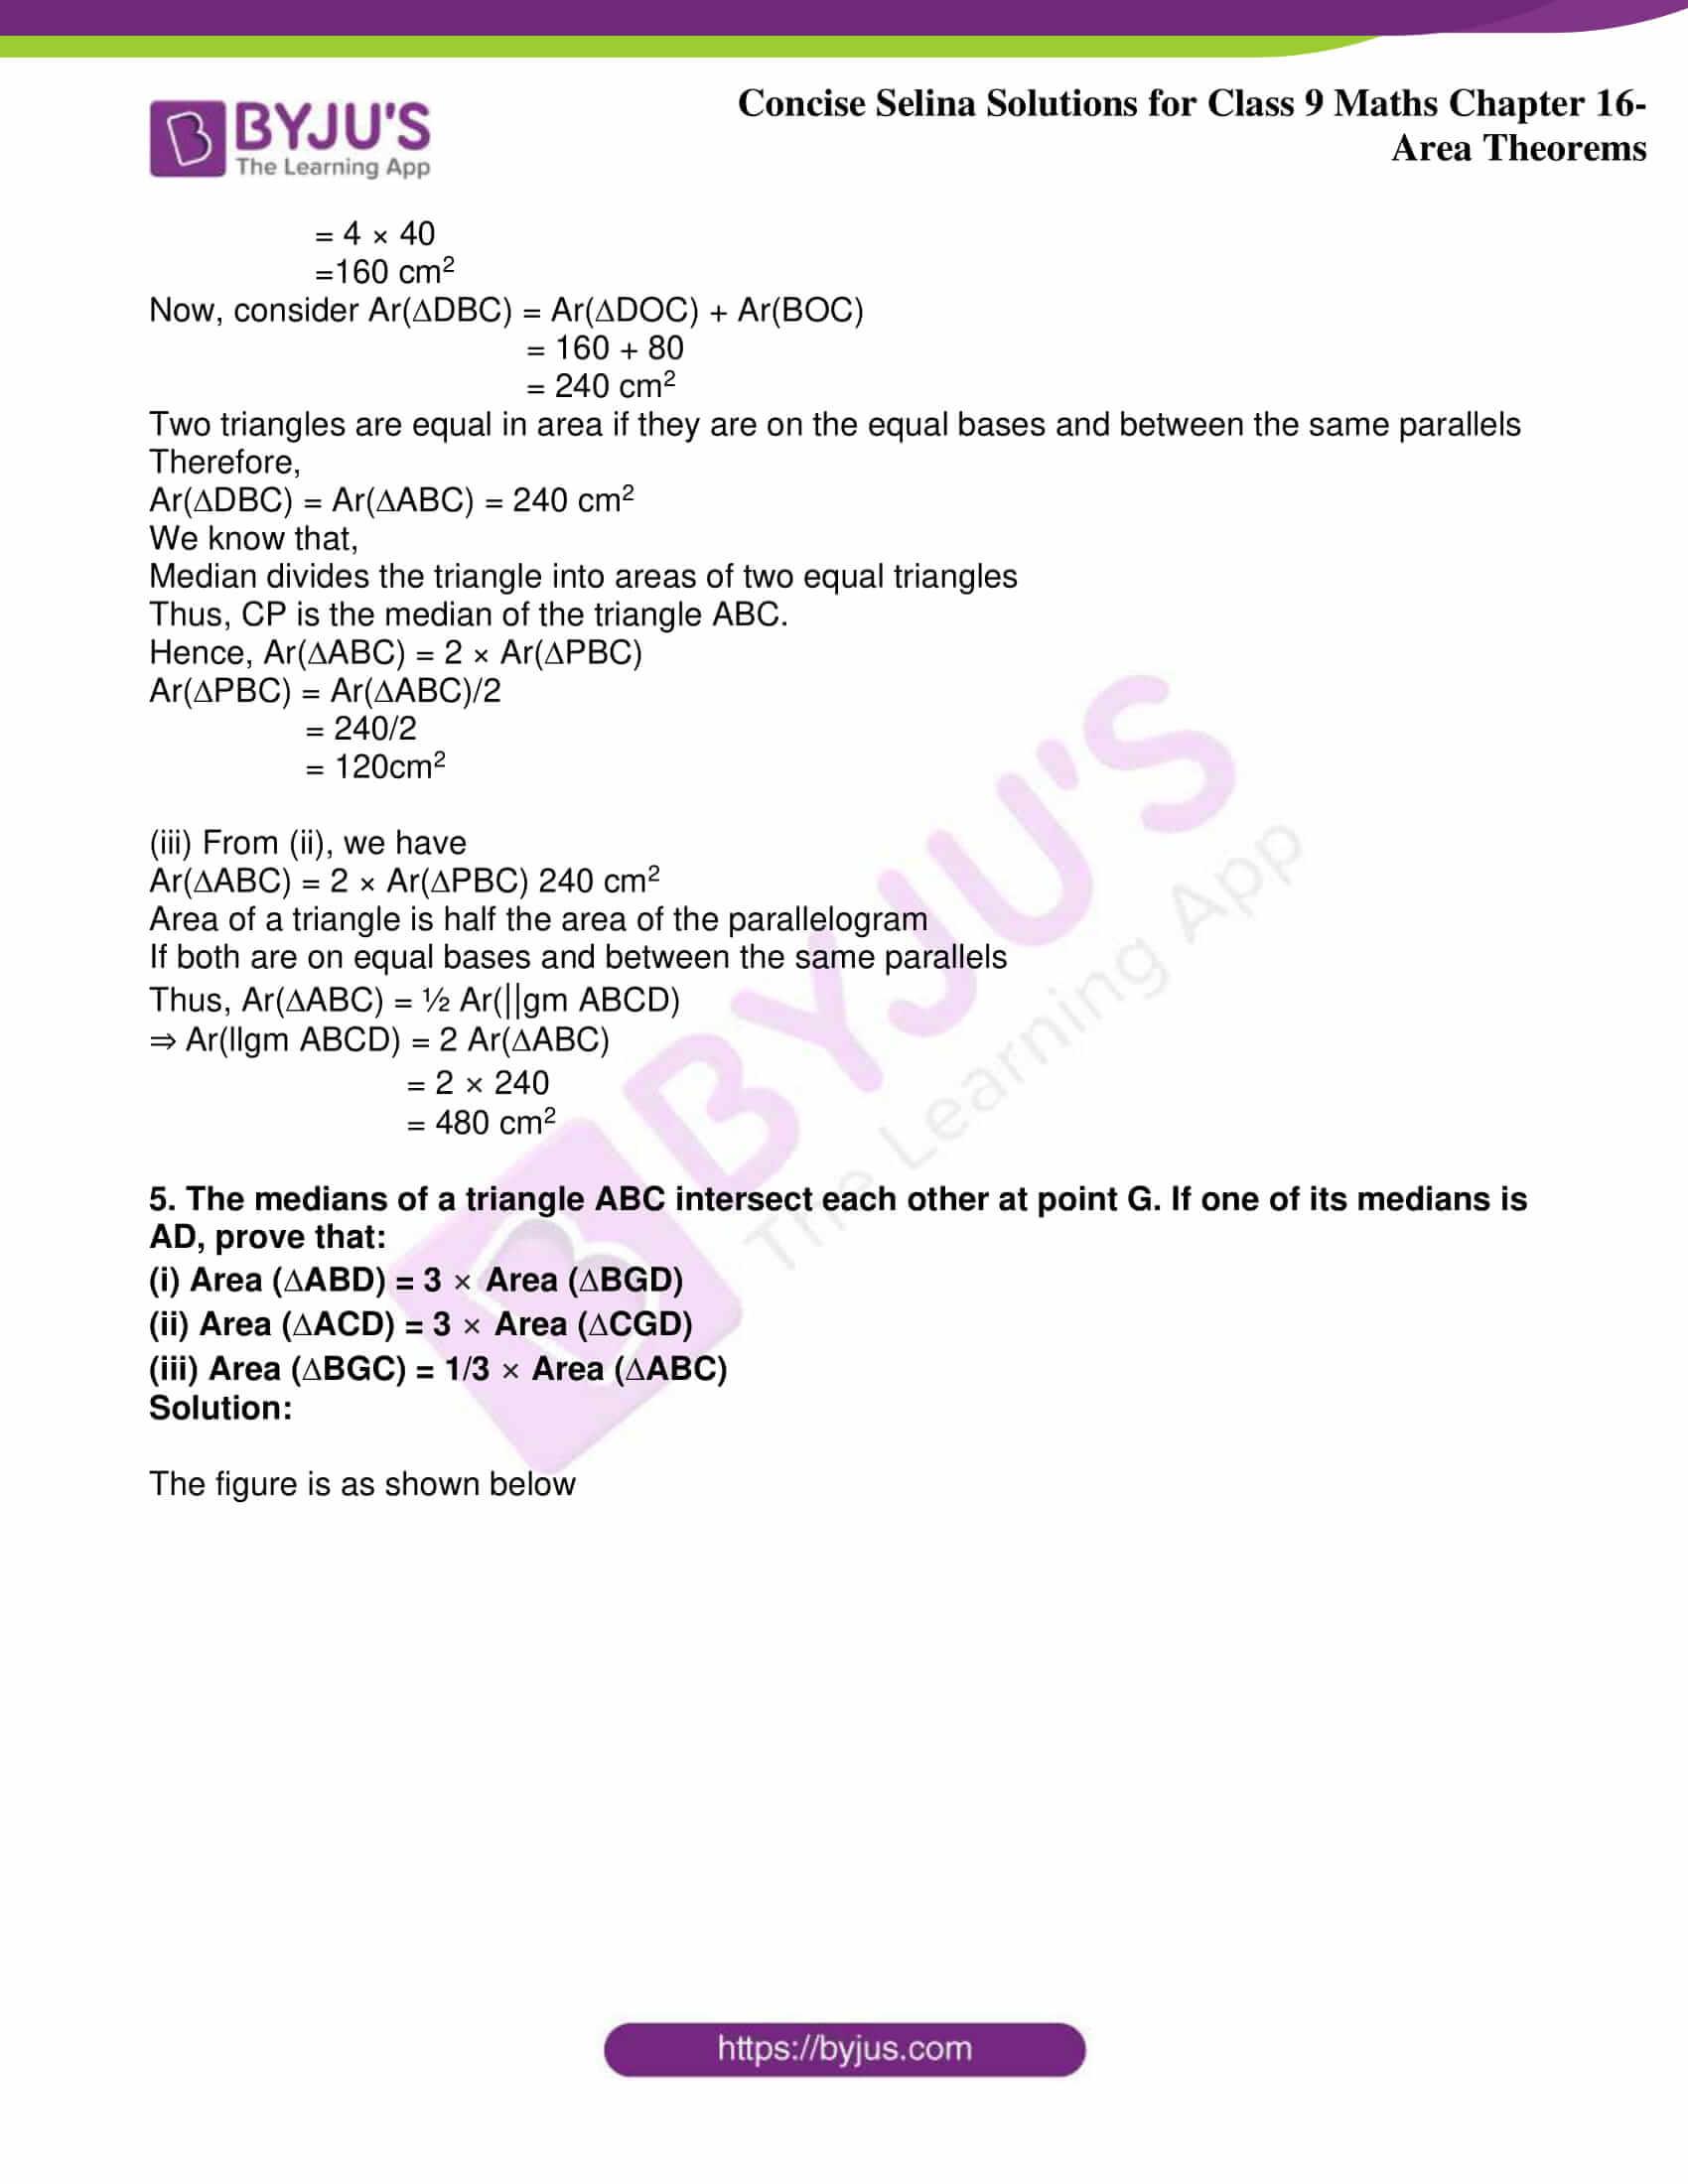 icse class 9 jun9 maths selina solutions chapter 16 area theorems 29